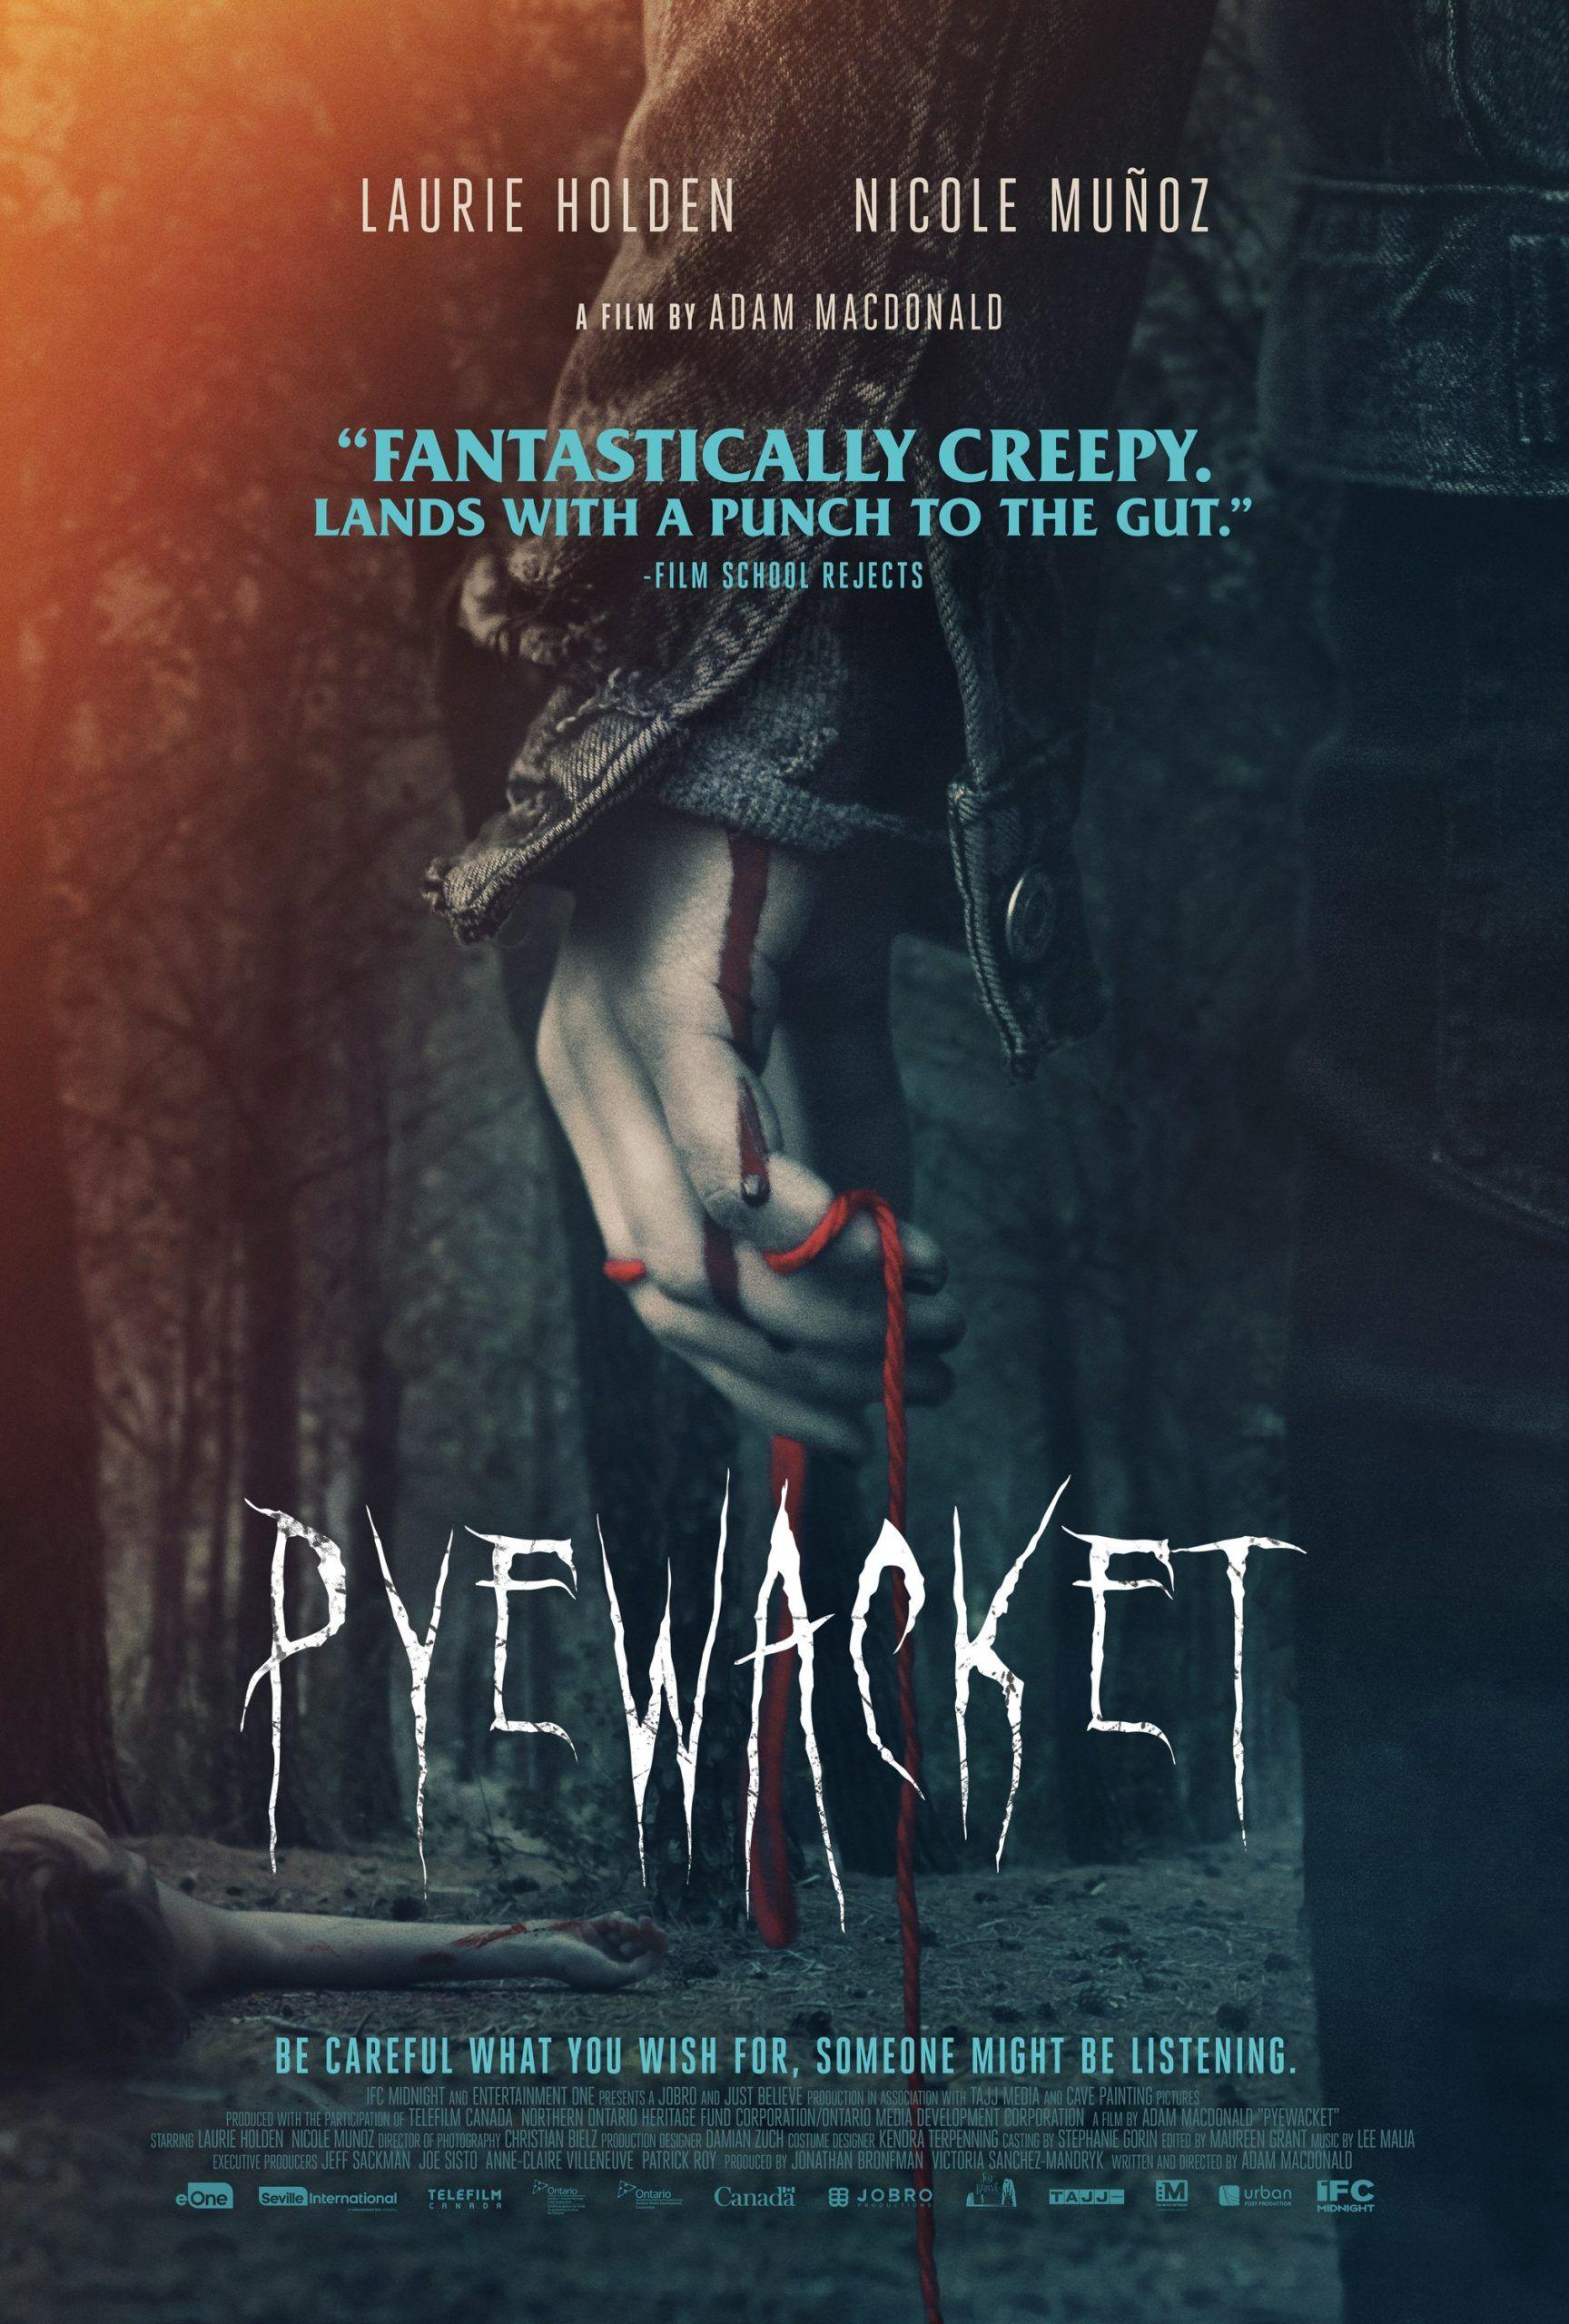 Pyewacket Supernatural horror movie streaming on Hulu